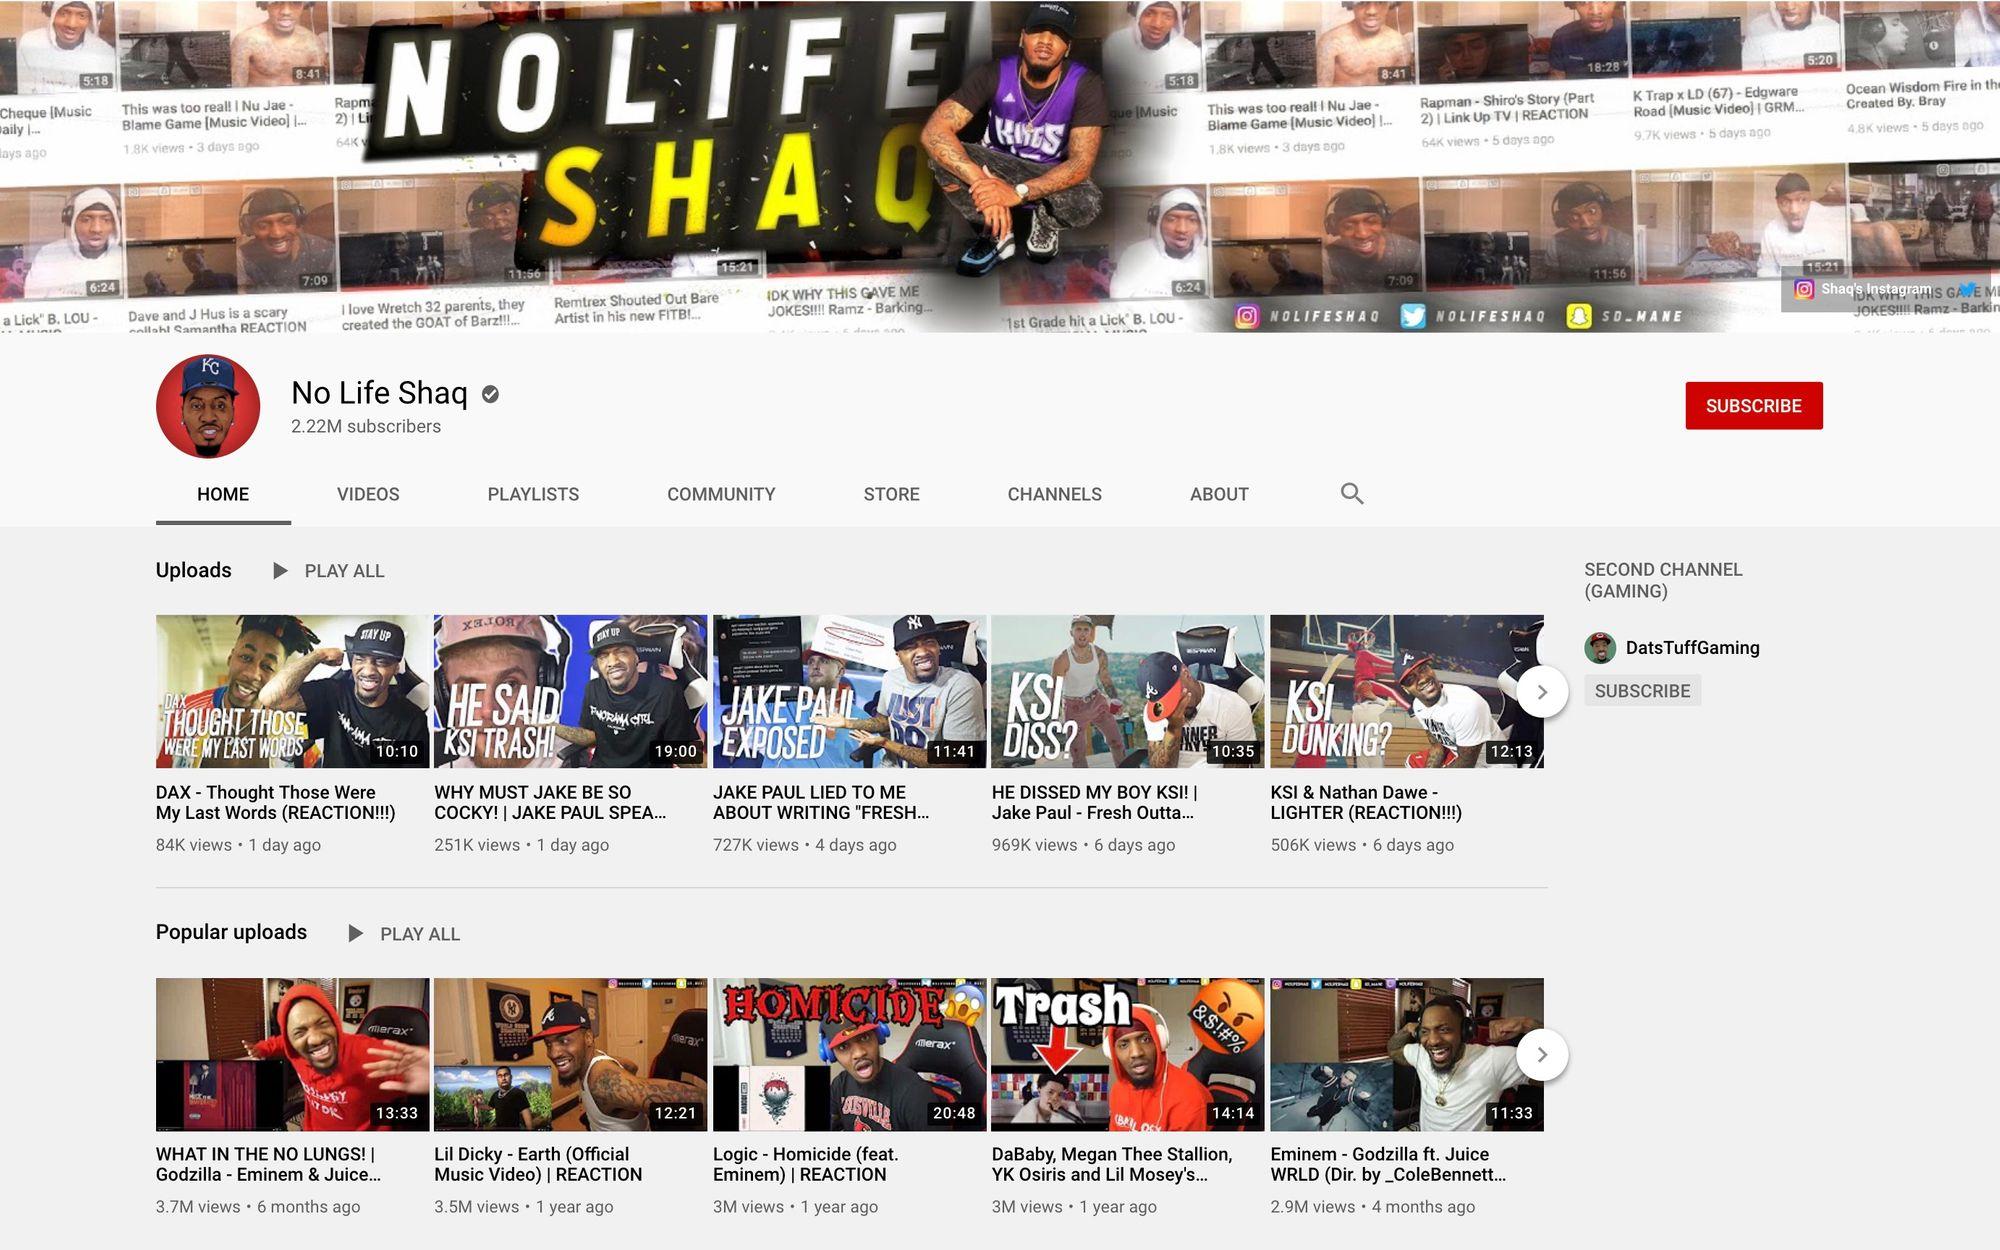 No Life Shaq YouTube channel